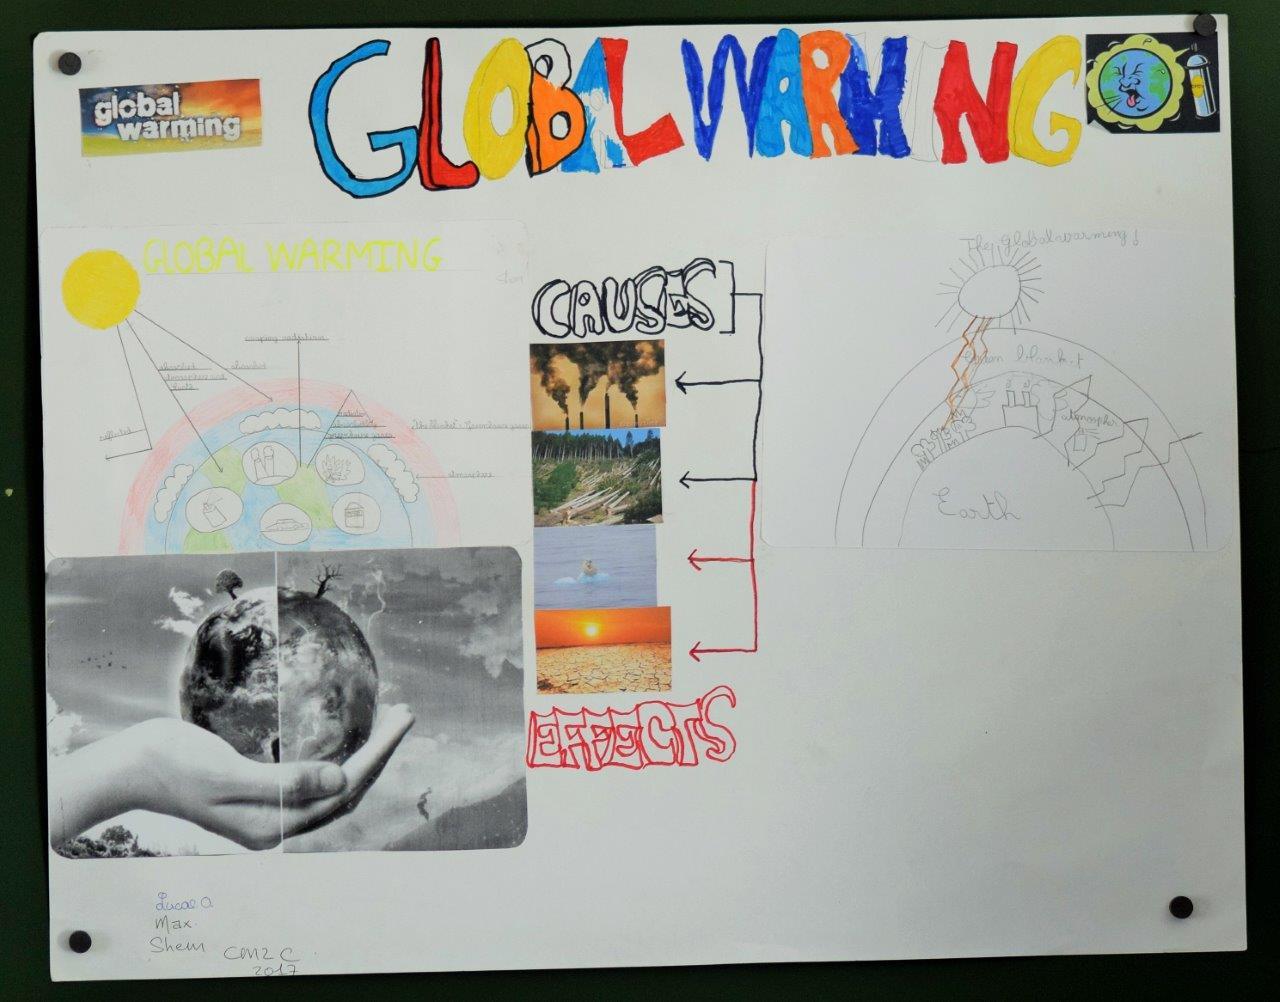 17-10-global-warming (5)